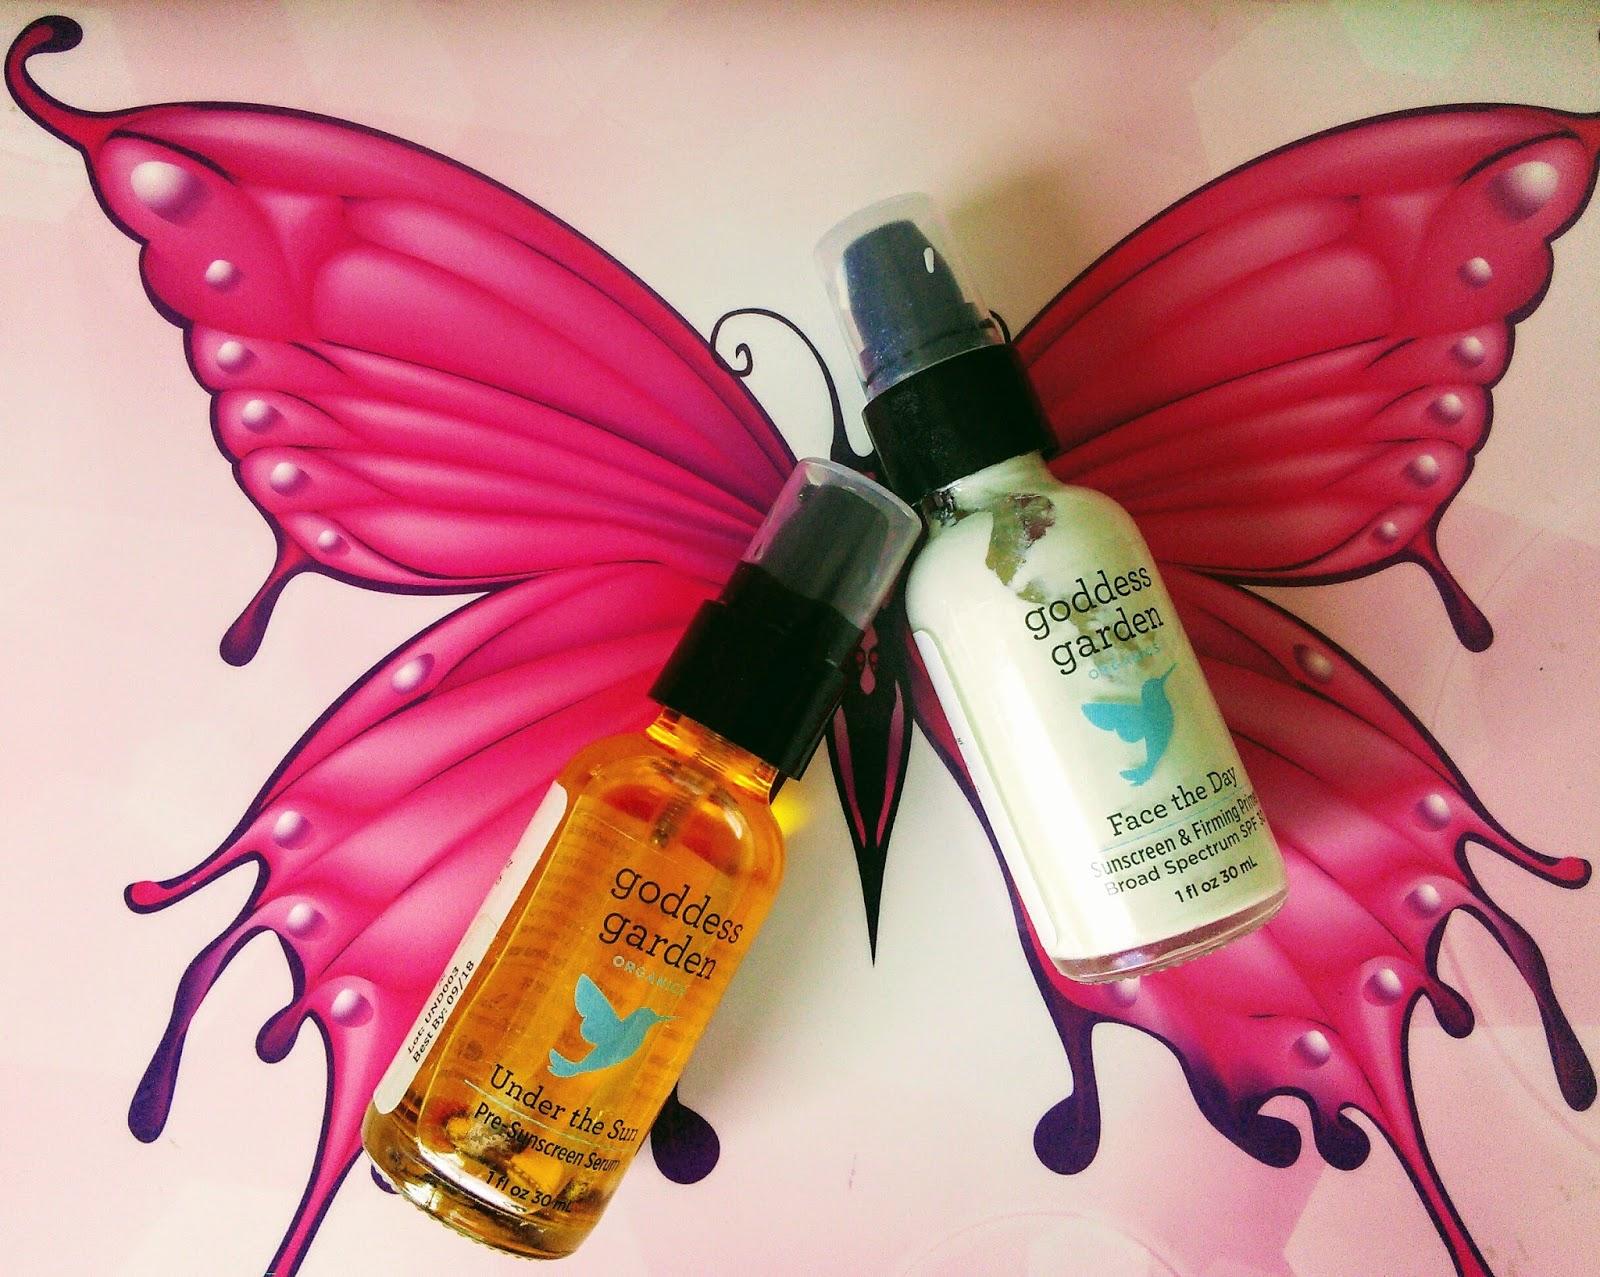 firming primer sunscreen the spf daily day oz ml pr garden fl face goddess organics moisturizer